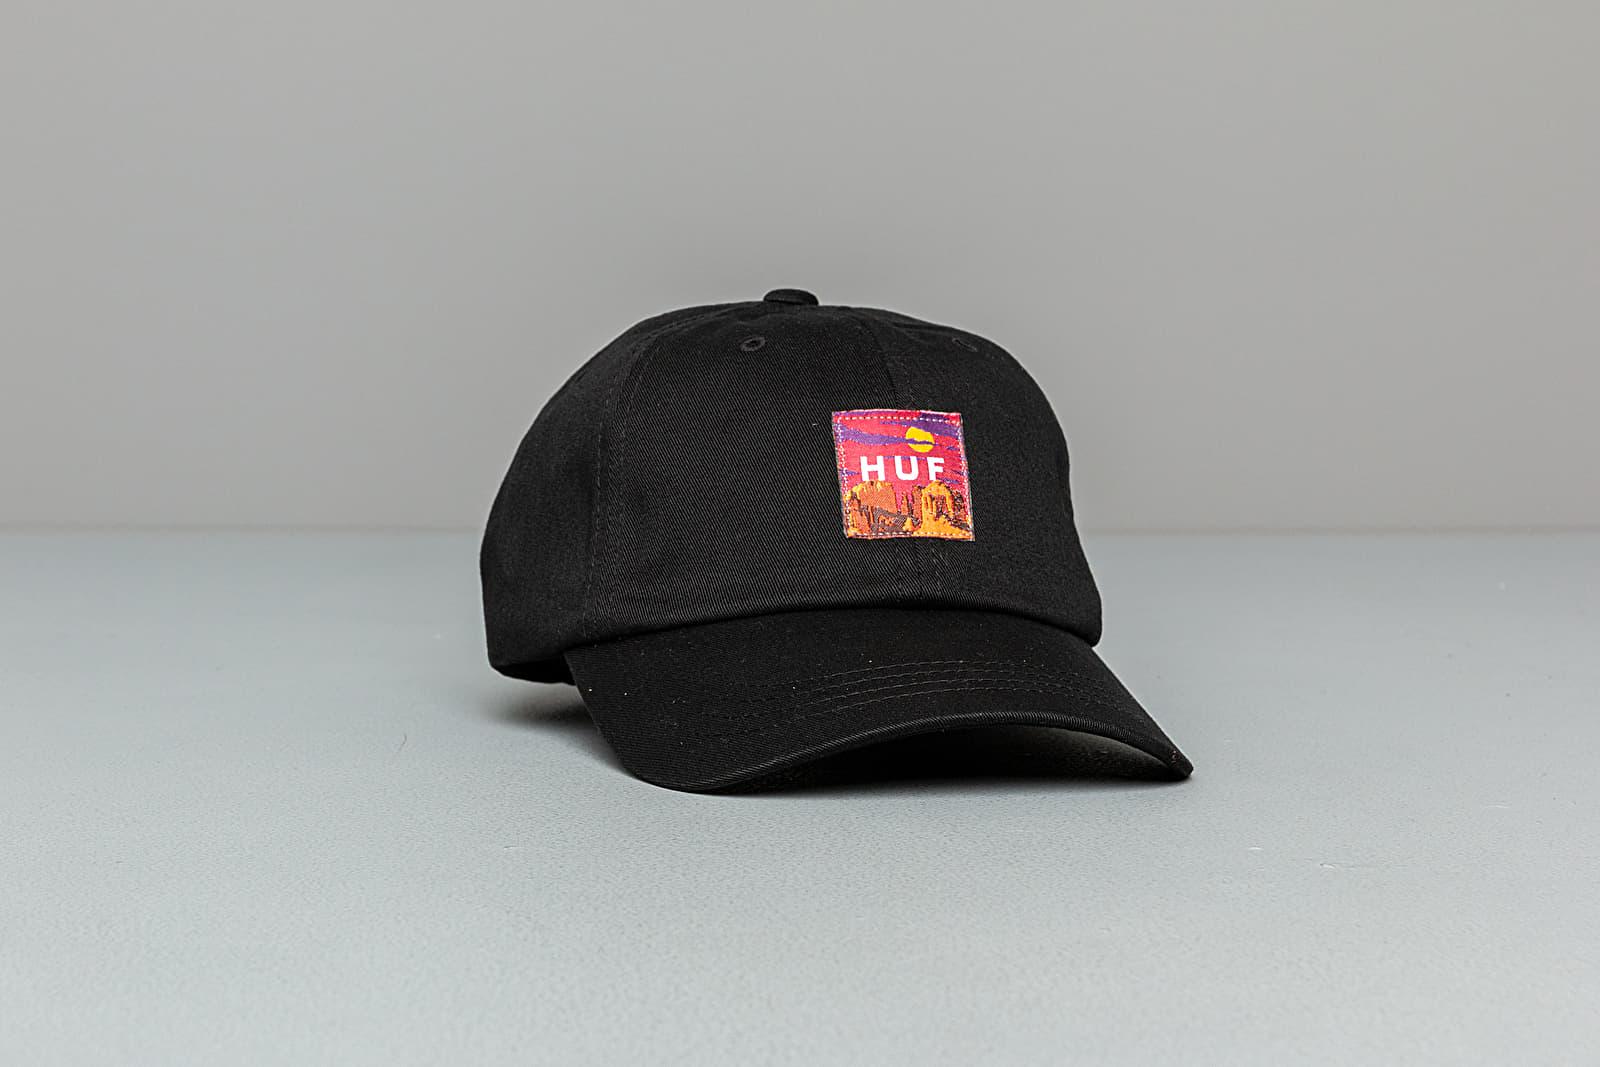 HUF Sedona CV 6 Panel Hat